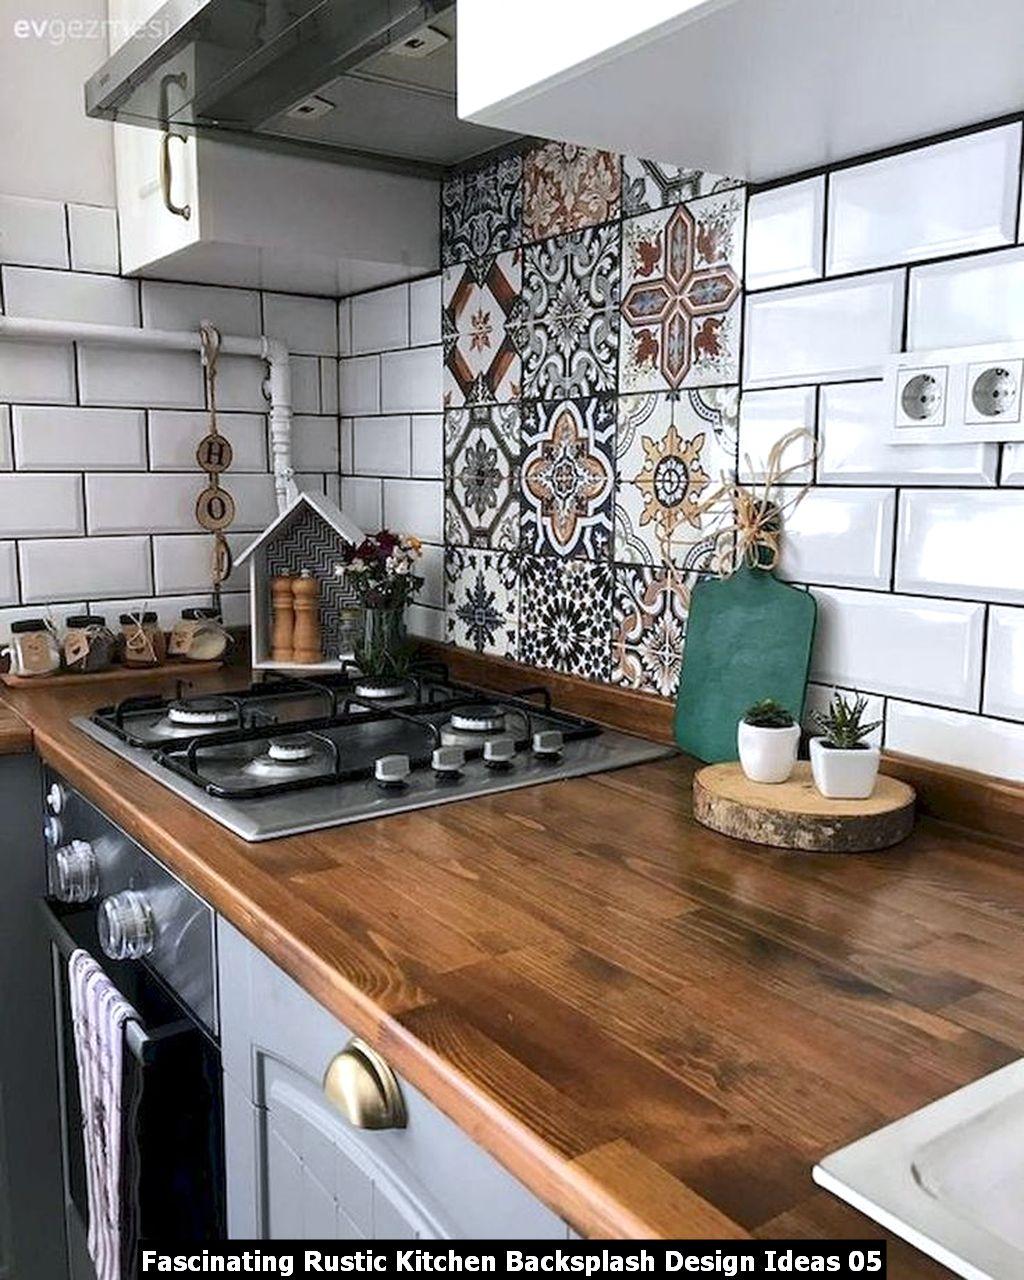 Fascinating Rustic Kitchen Backsplash Design Ideas 05